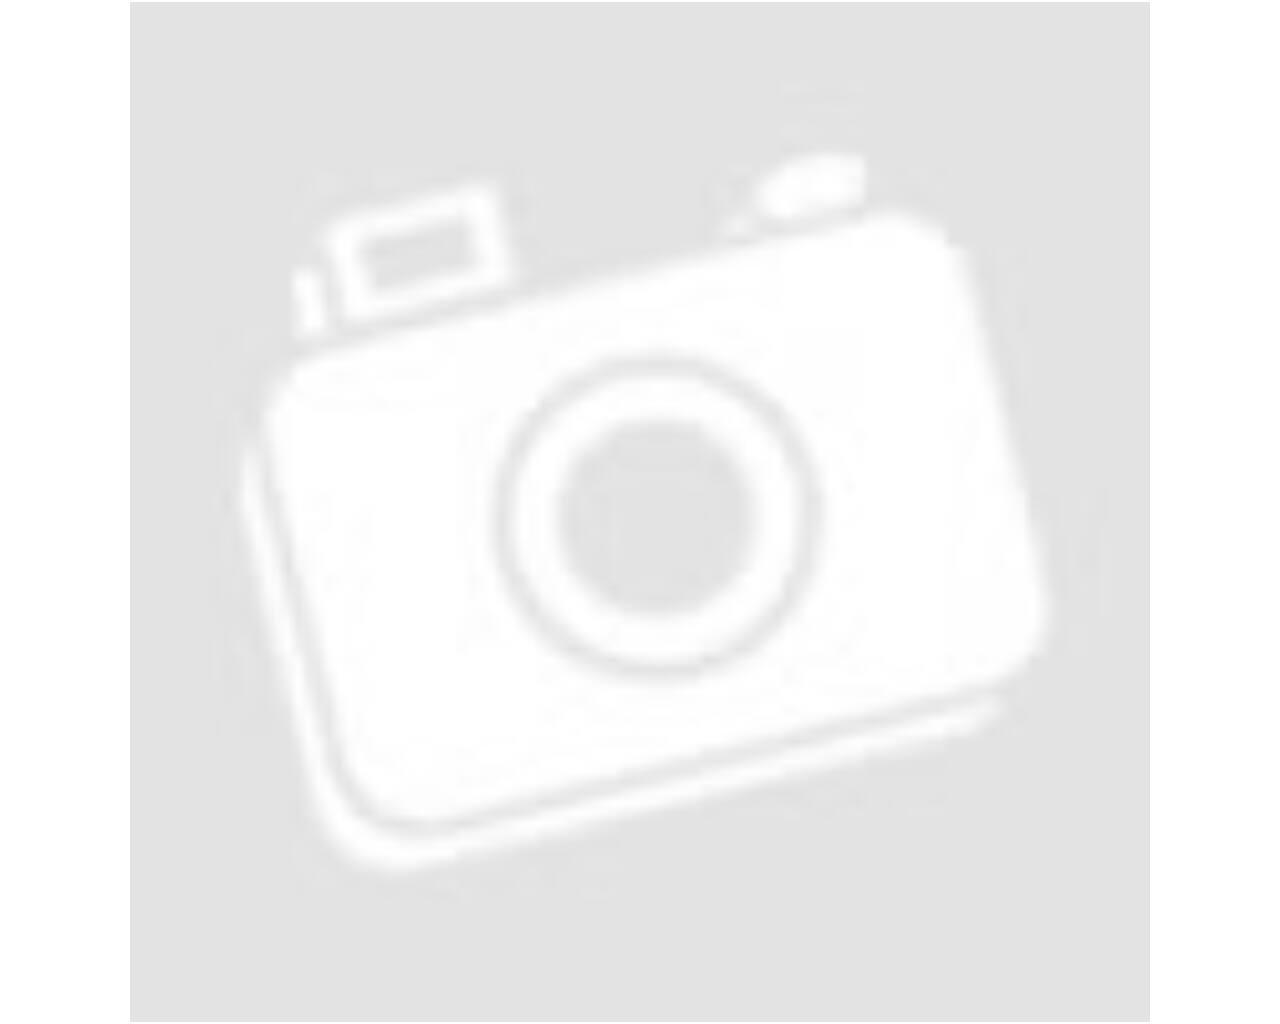 Grunman sarló hosszú fogantyúval, 55 cm